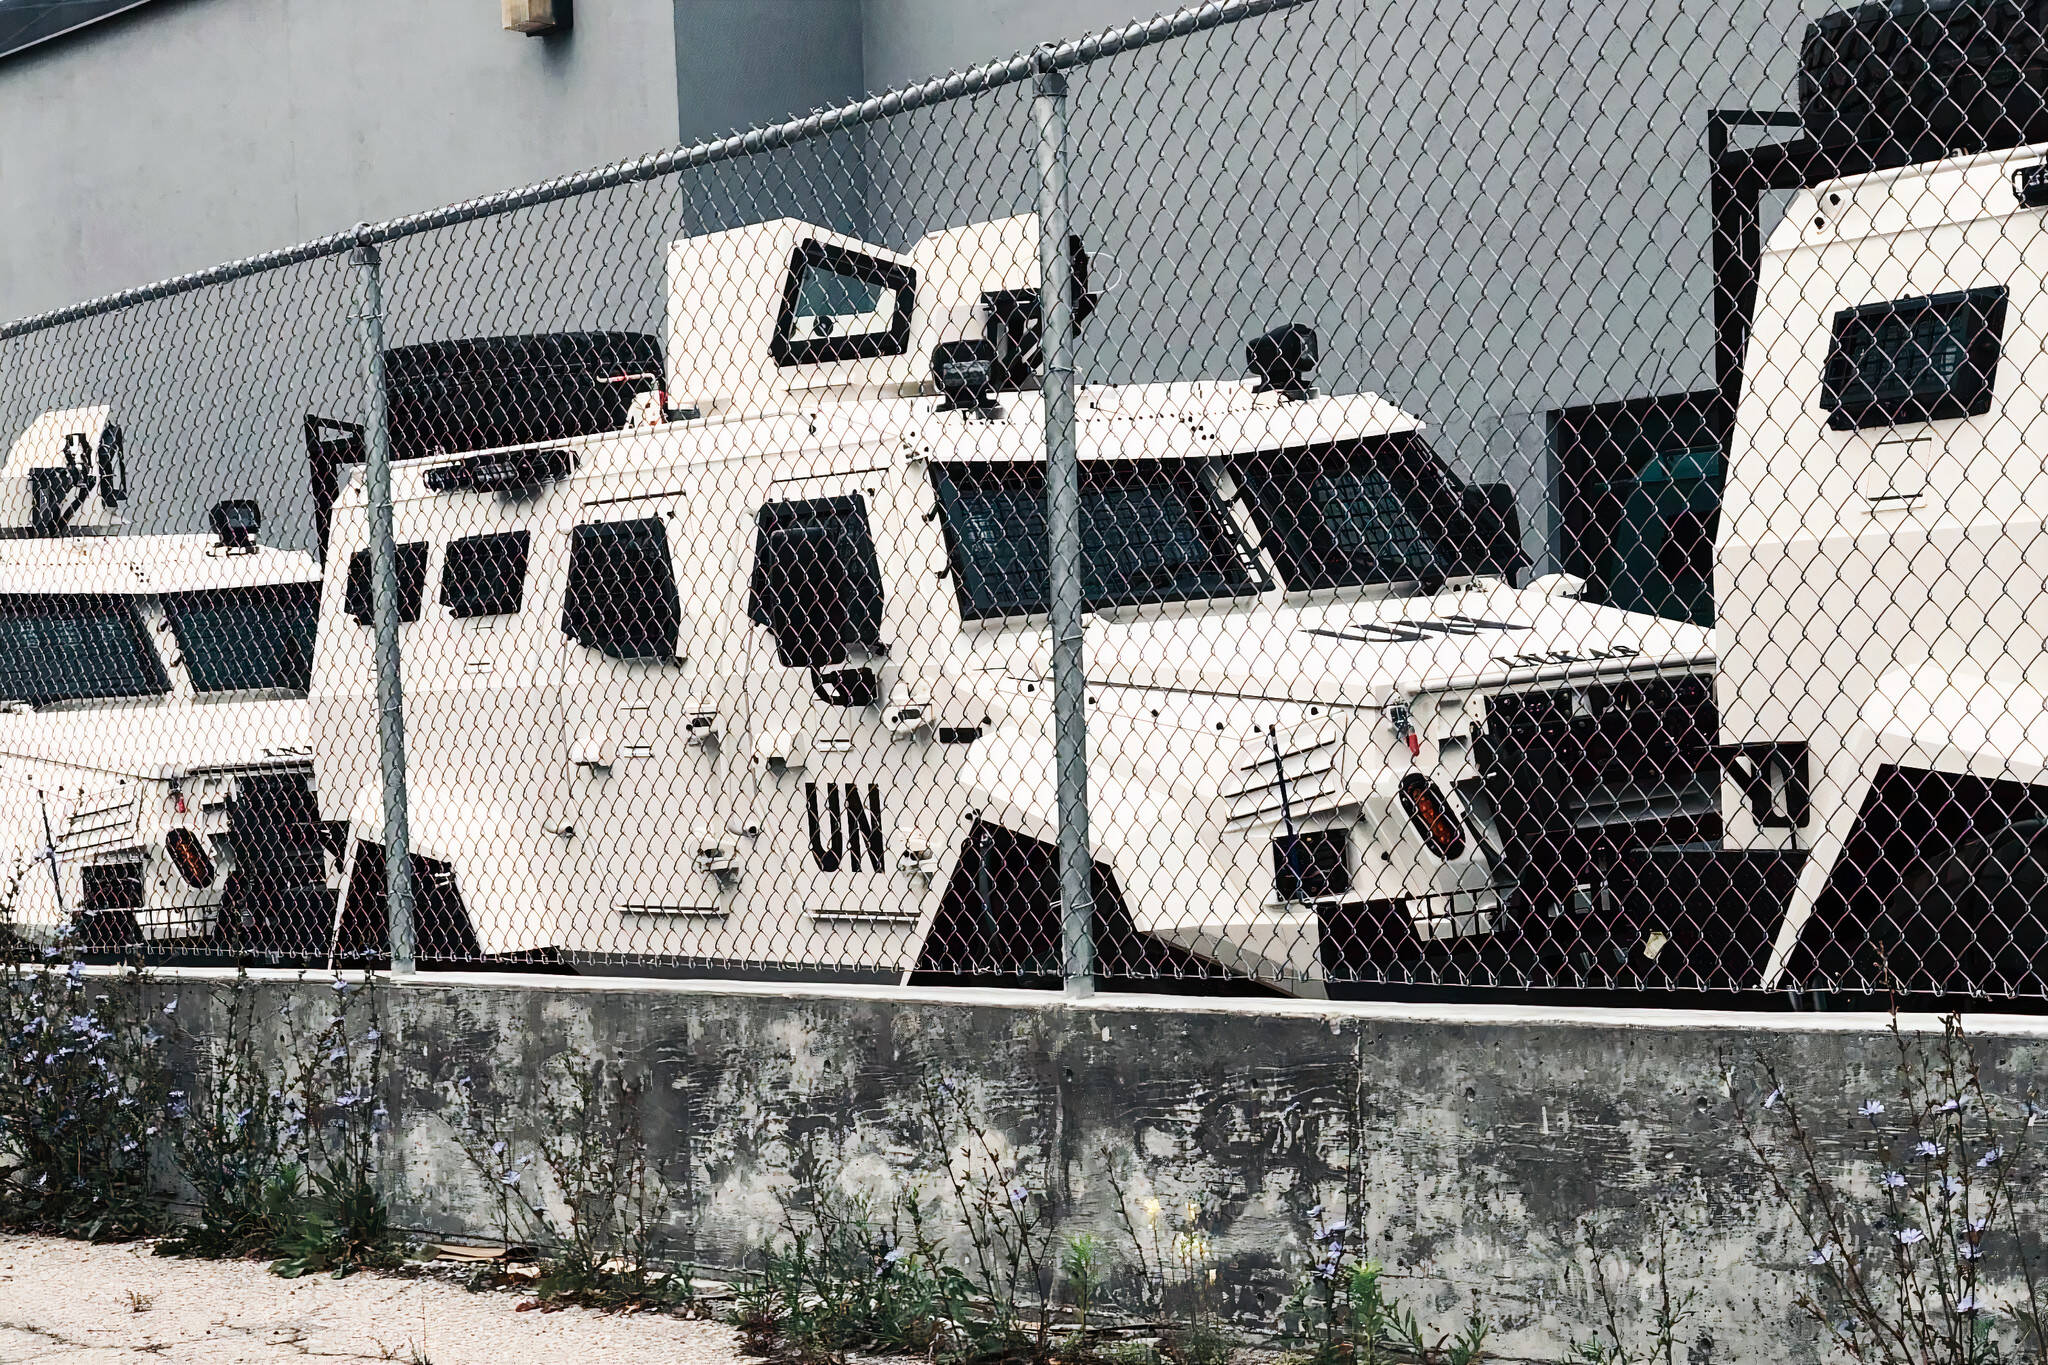 UN vehicles toronto